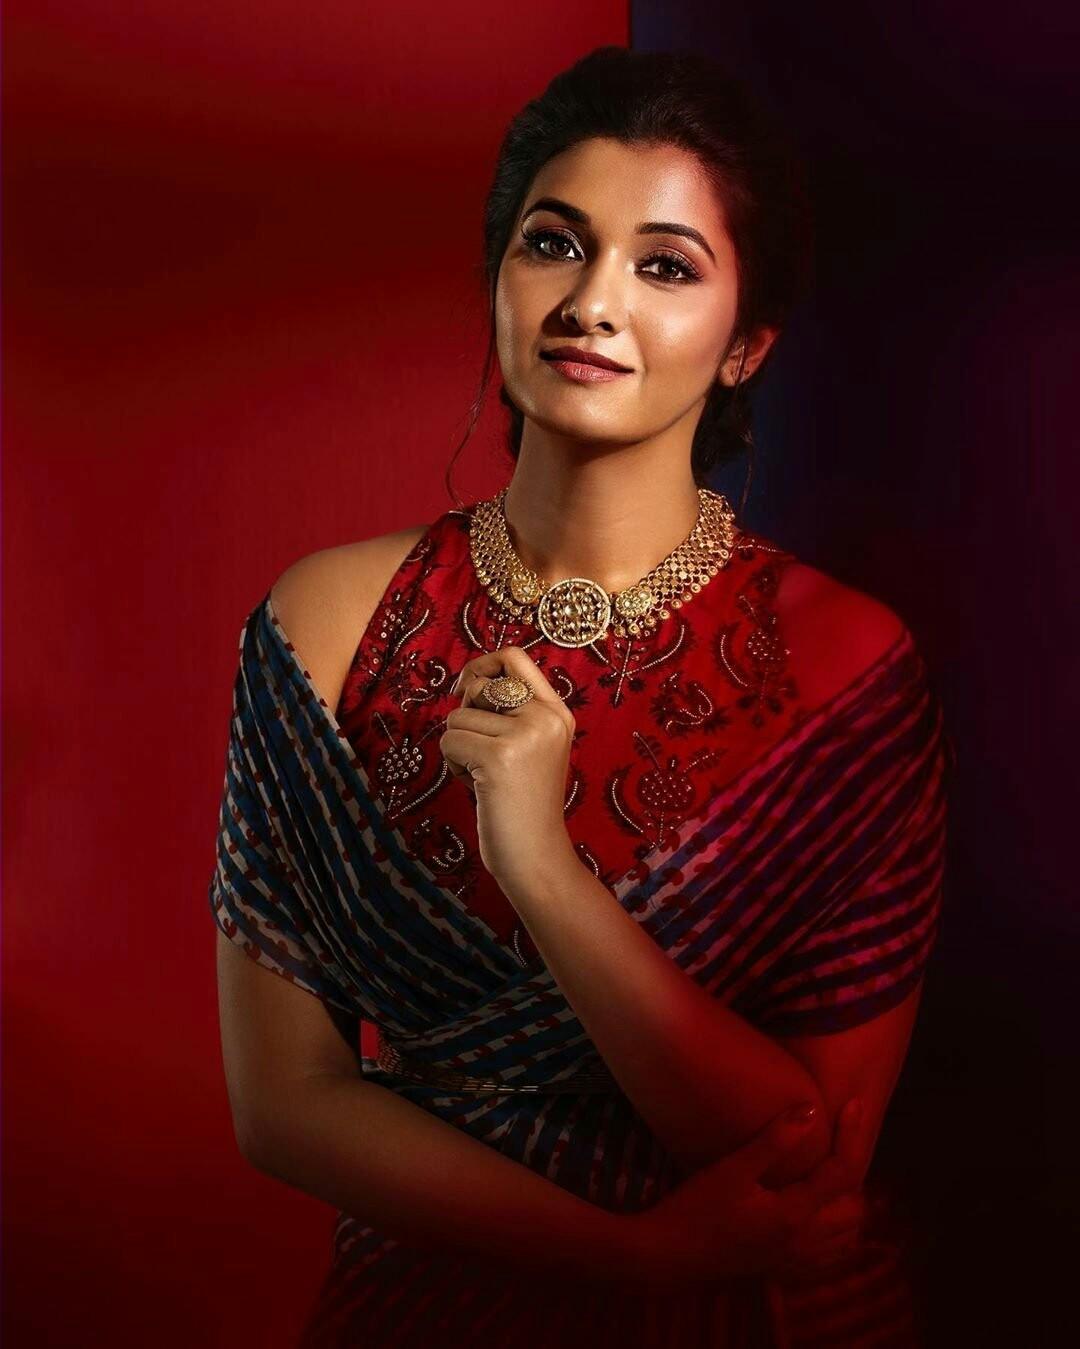 Priya Bhavani Shankar Glam New Stills